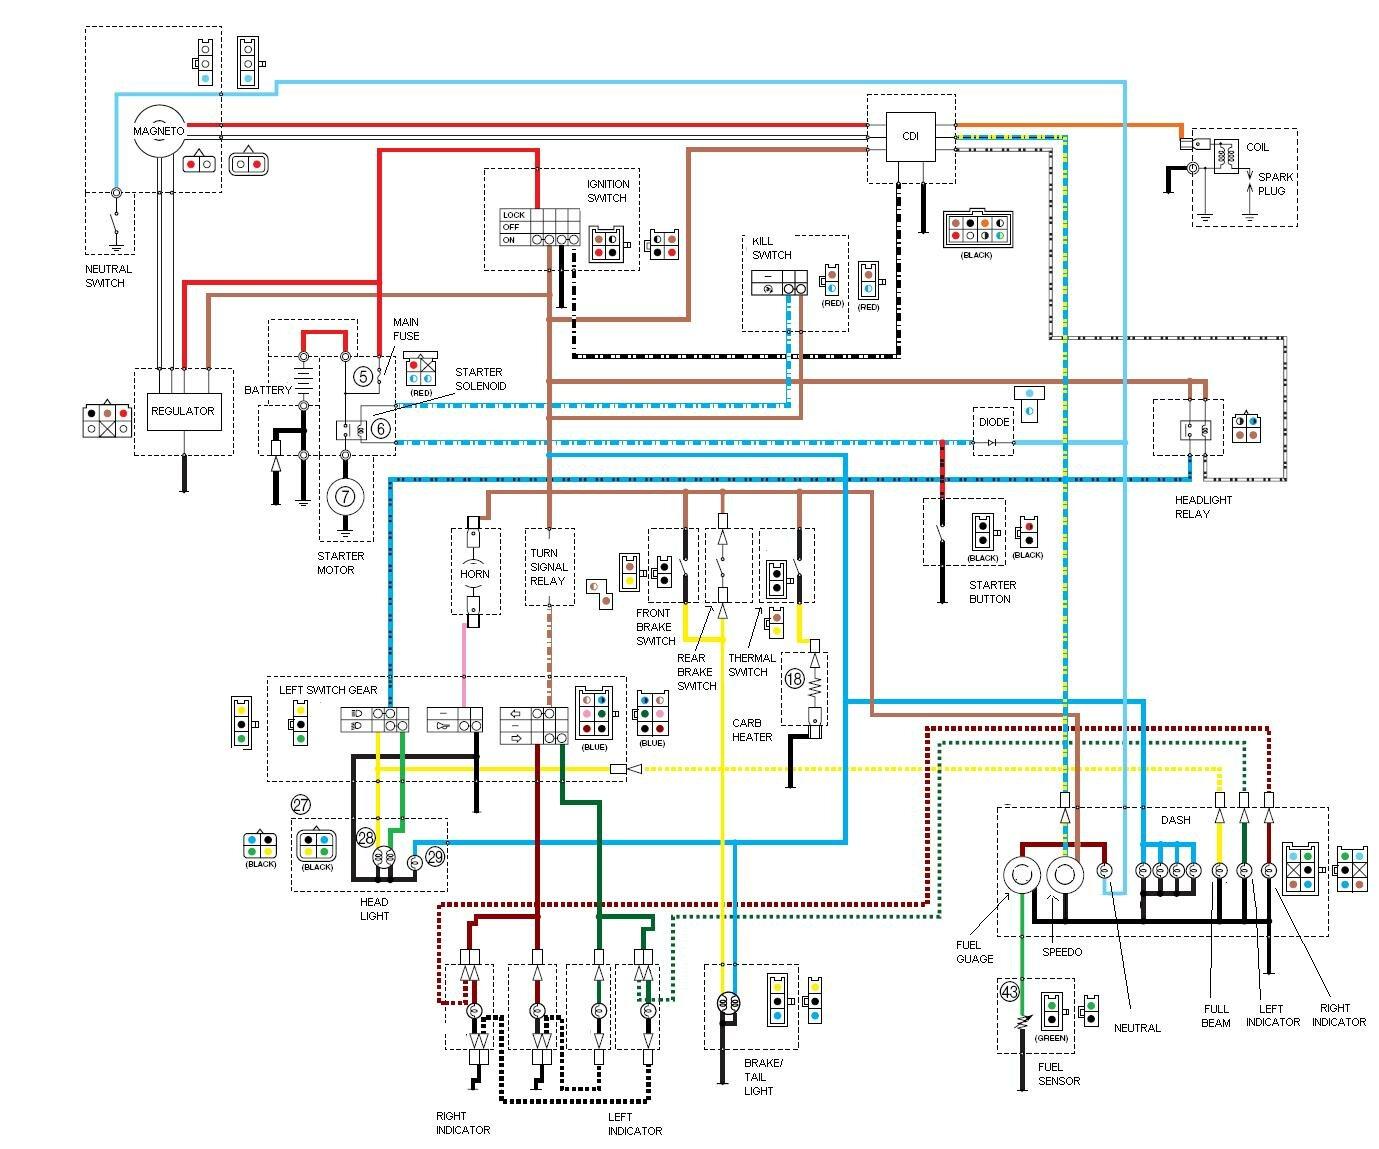 hight resolution of hyundai golf cart hyundai golf cart wiring diagram hyundai santa fe parts diagram wiring